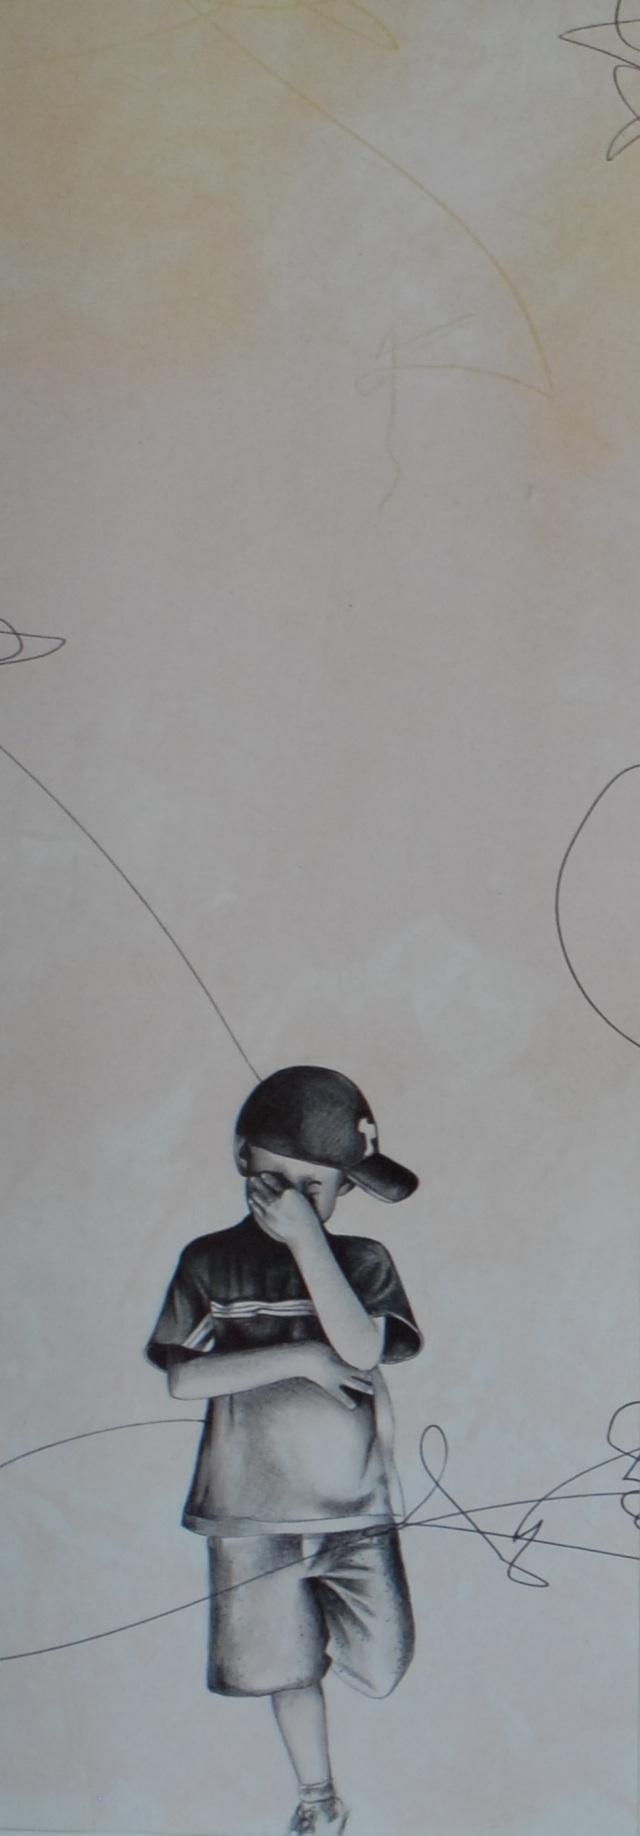 "LAGRIMAS DE SOLEDAD, graphite, pastel and mixed media on paper, 20"" x 8 1/2""  SOLD"